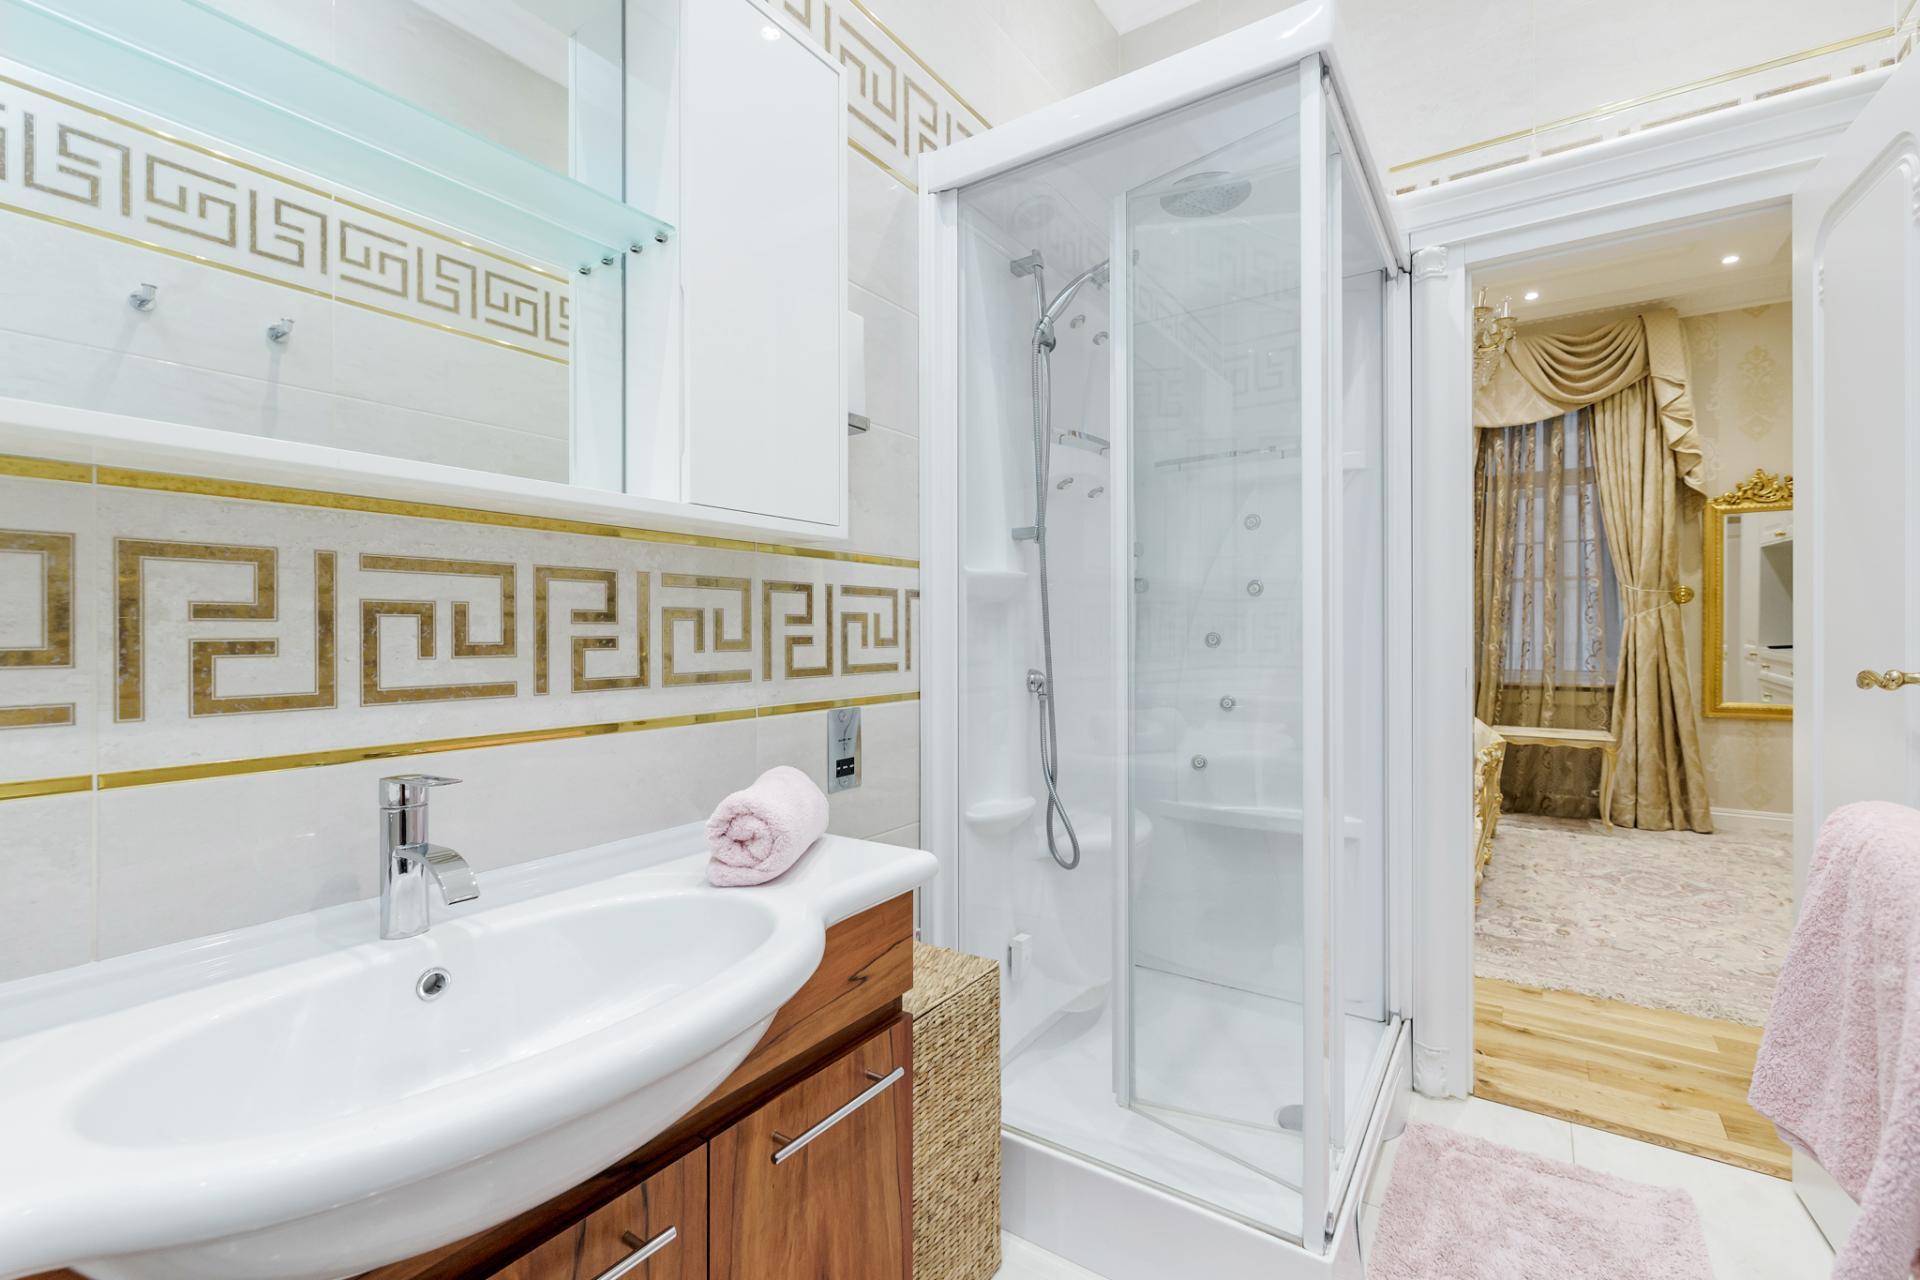 Shower at Grosvenor Square Apartment, Mayfair, London